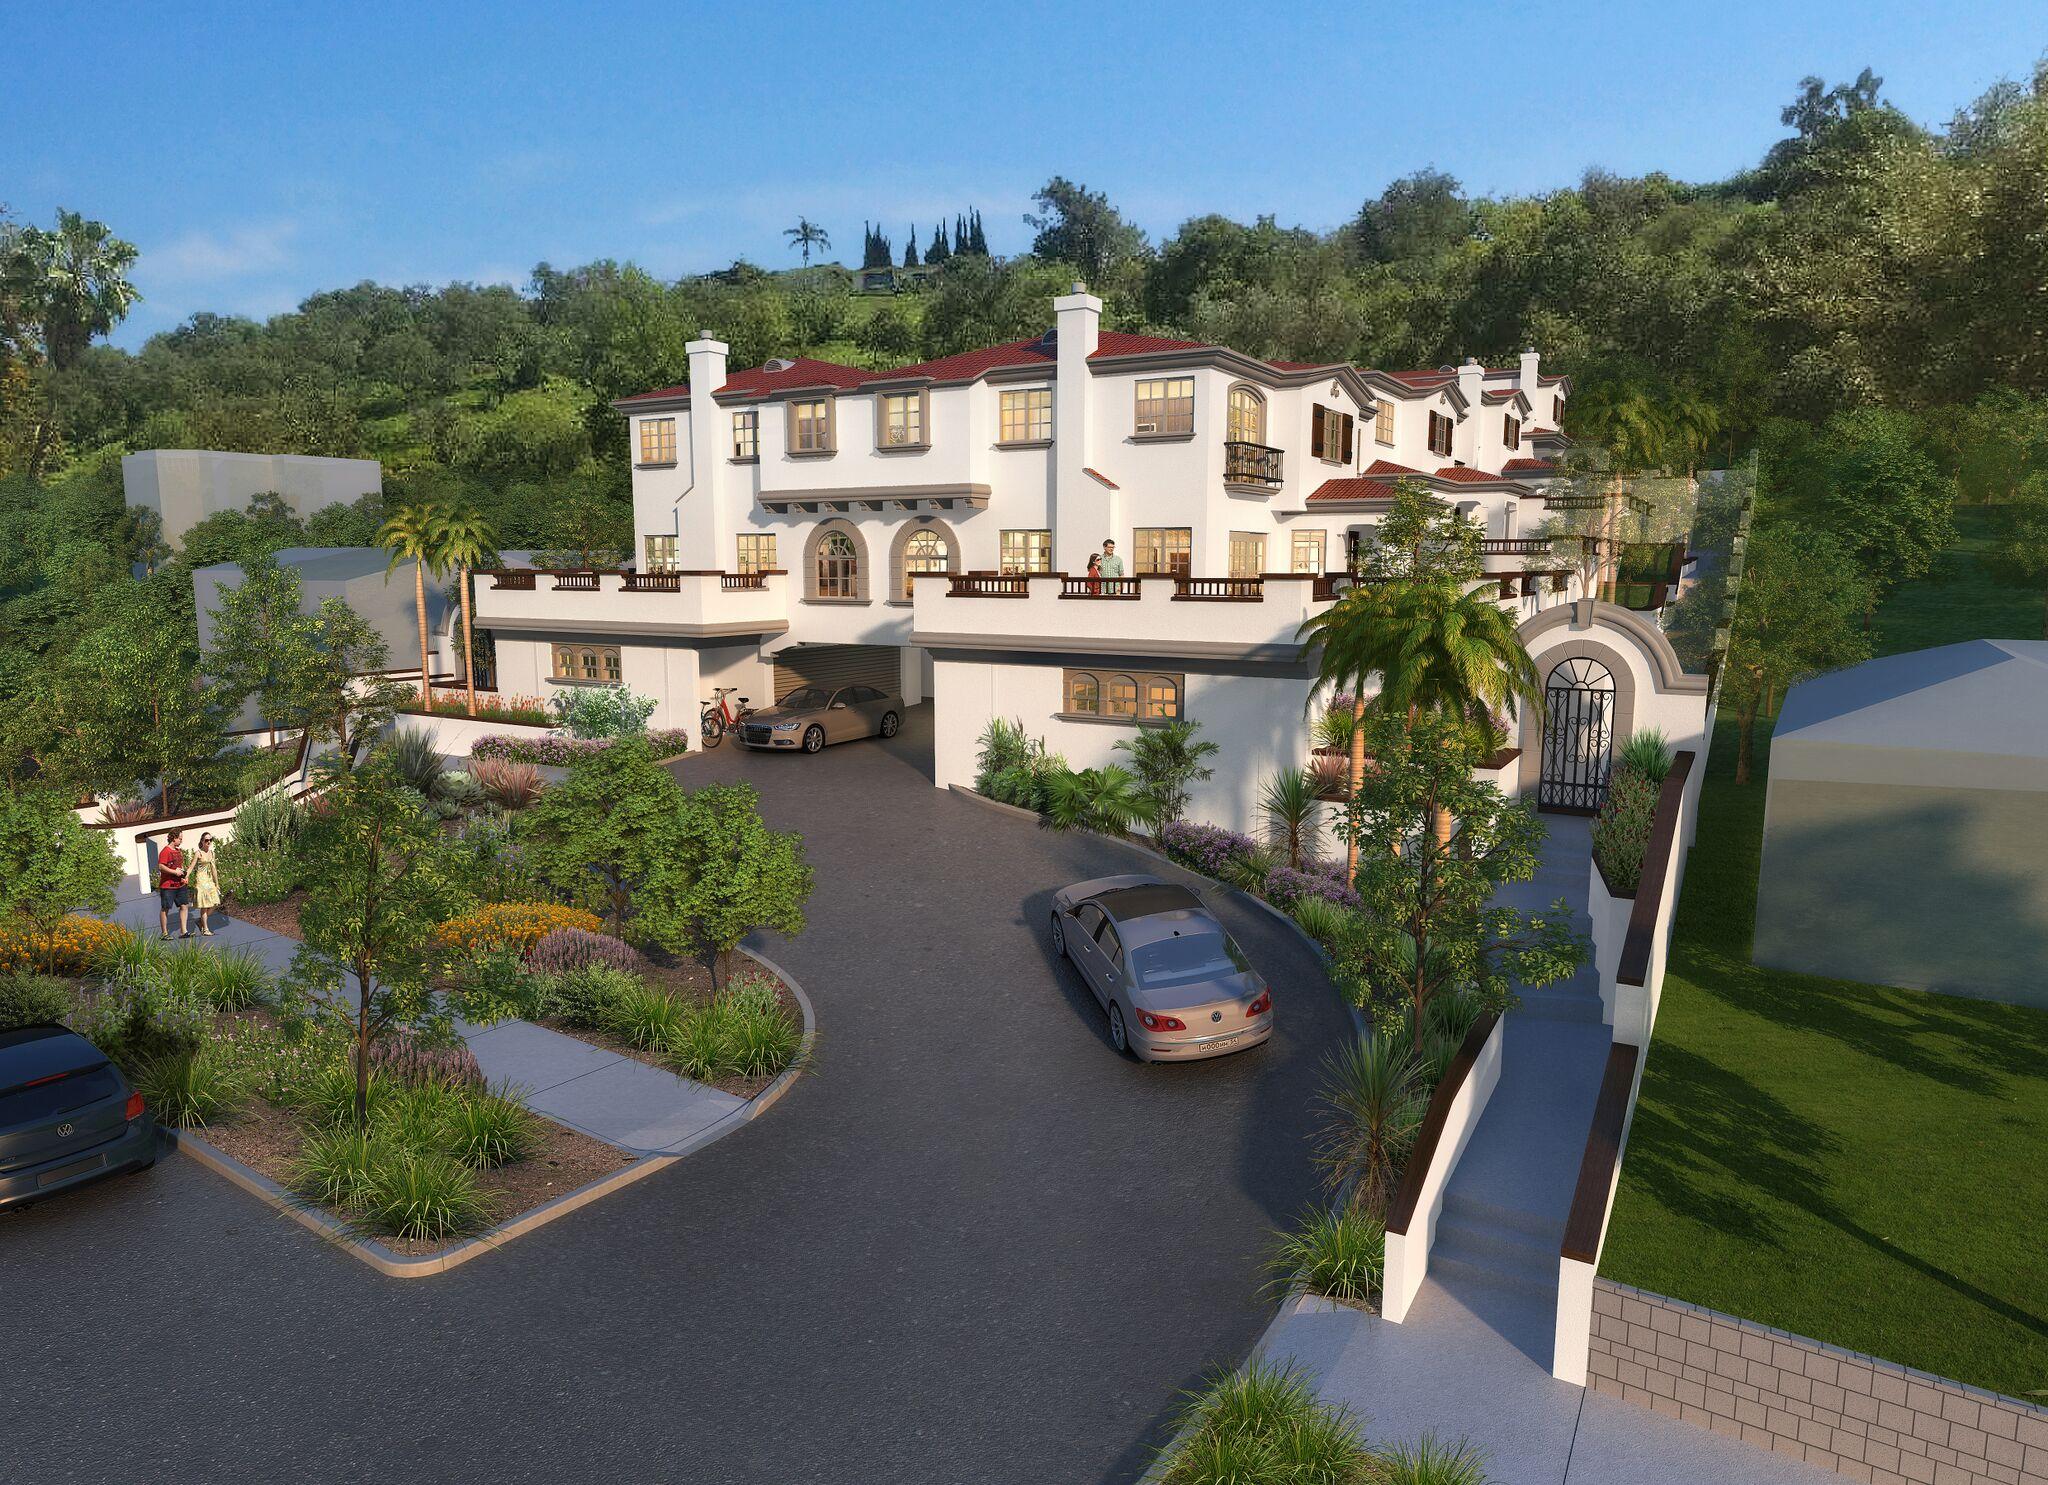 Los Angeles Real Estate Development Companies